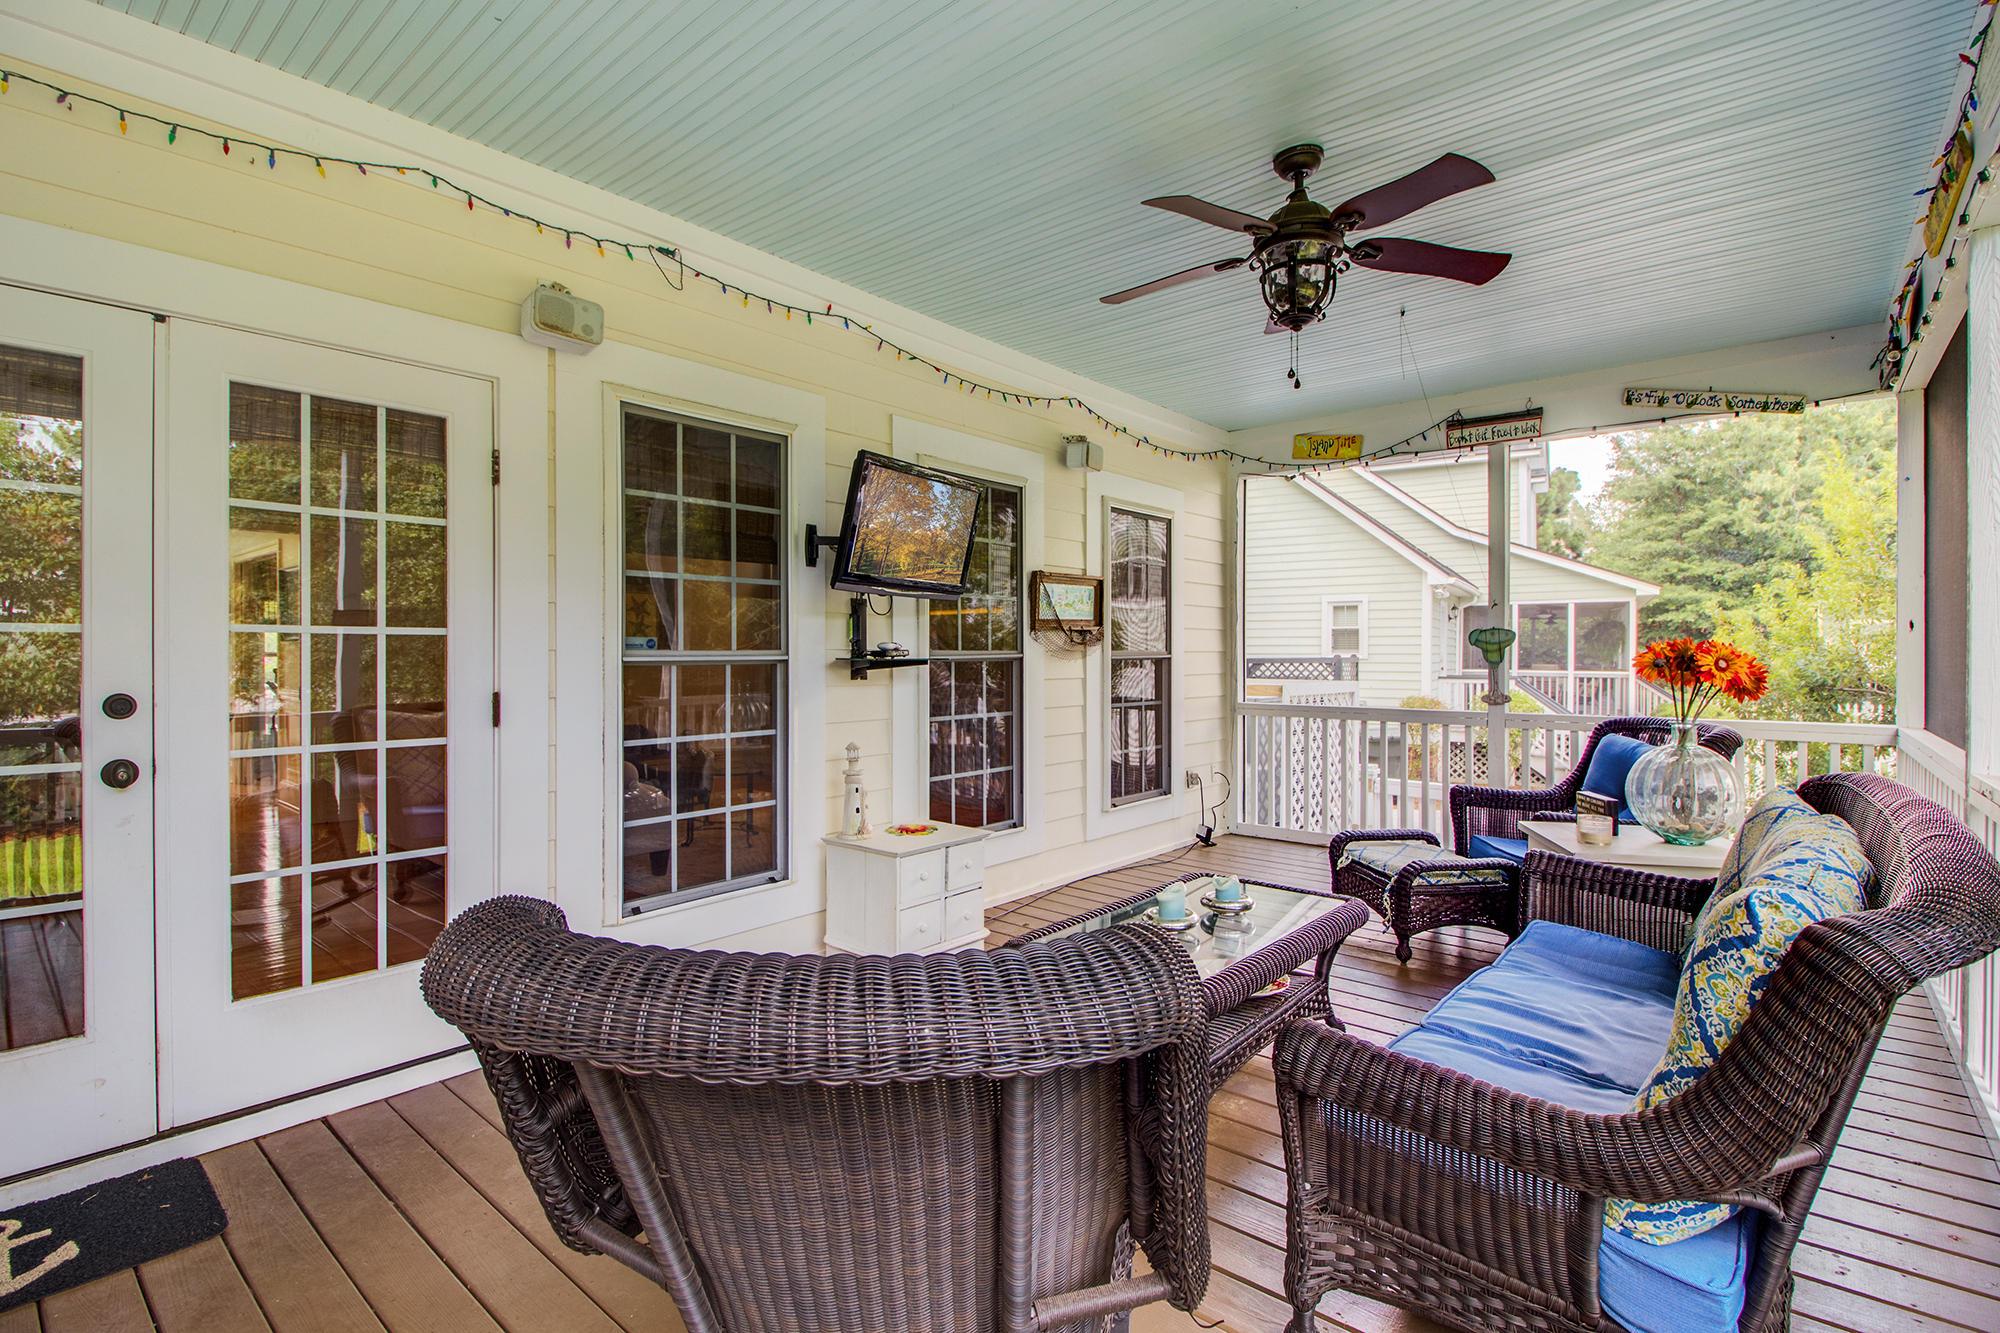 Codners Ferry Park Homes For Sale - 227 Fairchild, Daniel Island, SC - 45